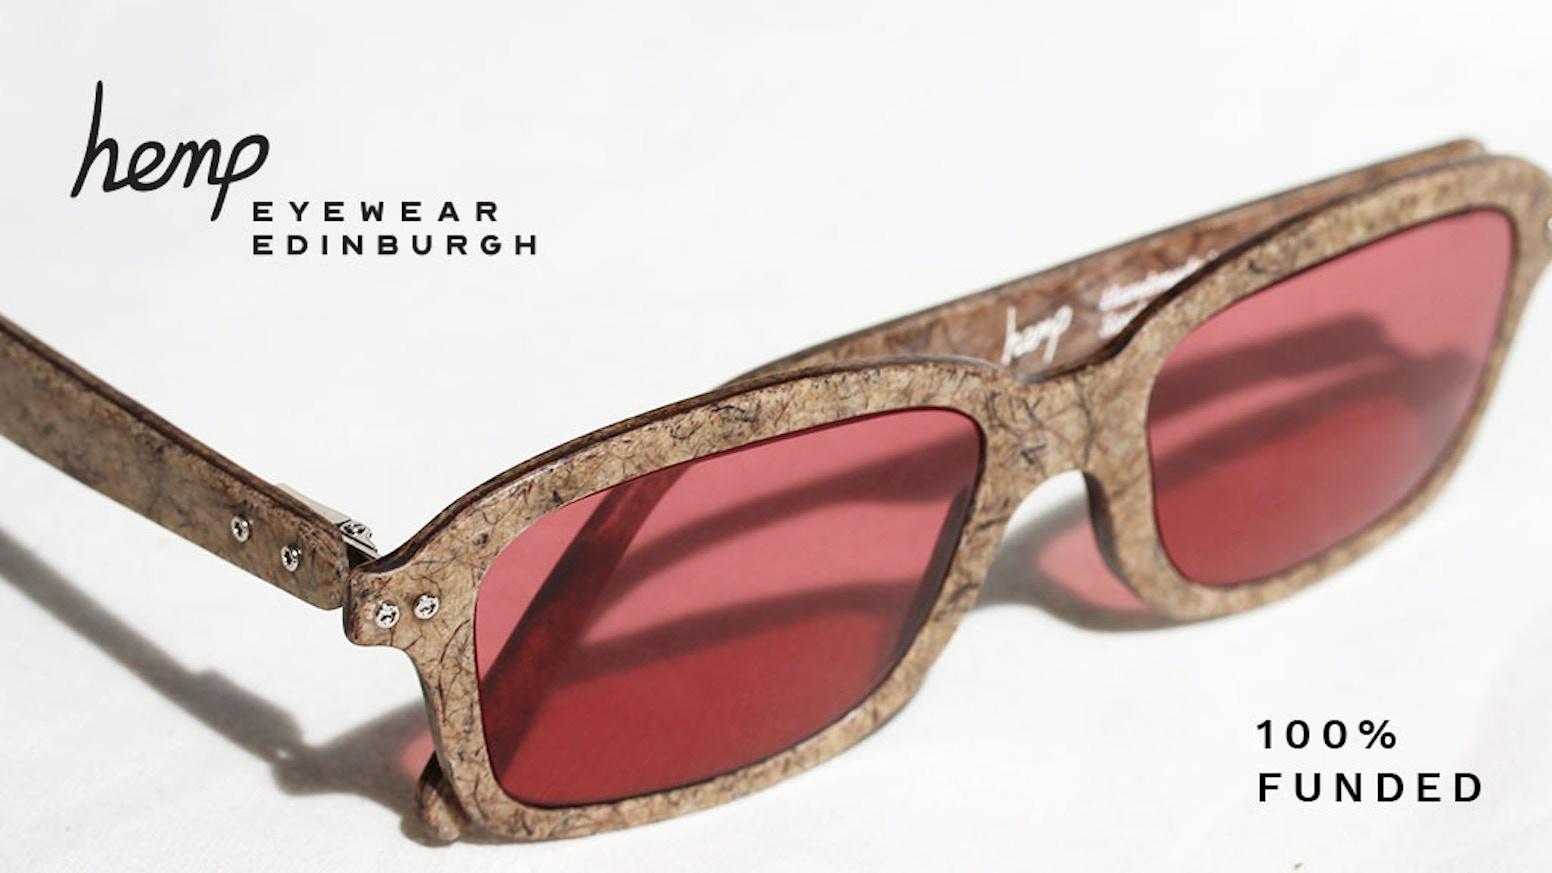 Handcrafted from hemp fibre and water, Hemp Eyewear is the ideal alternative to harmful plastics